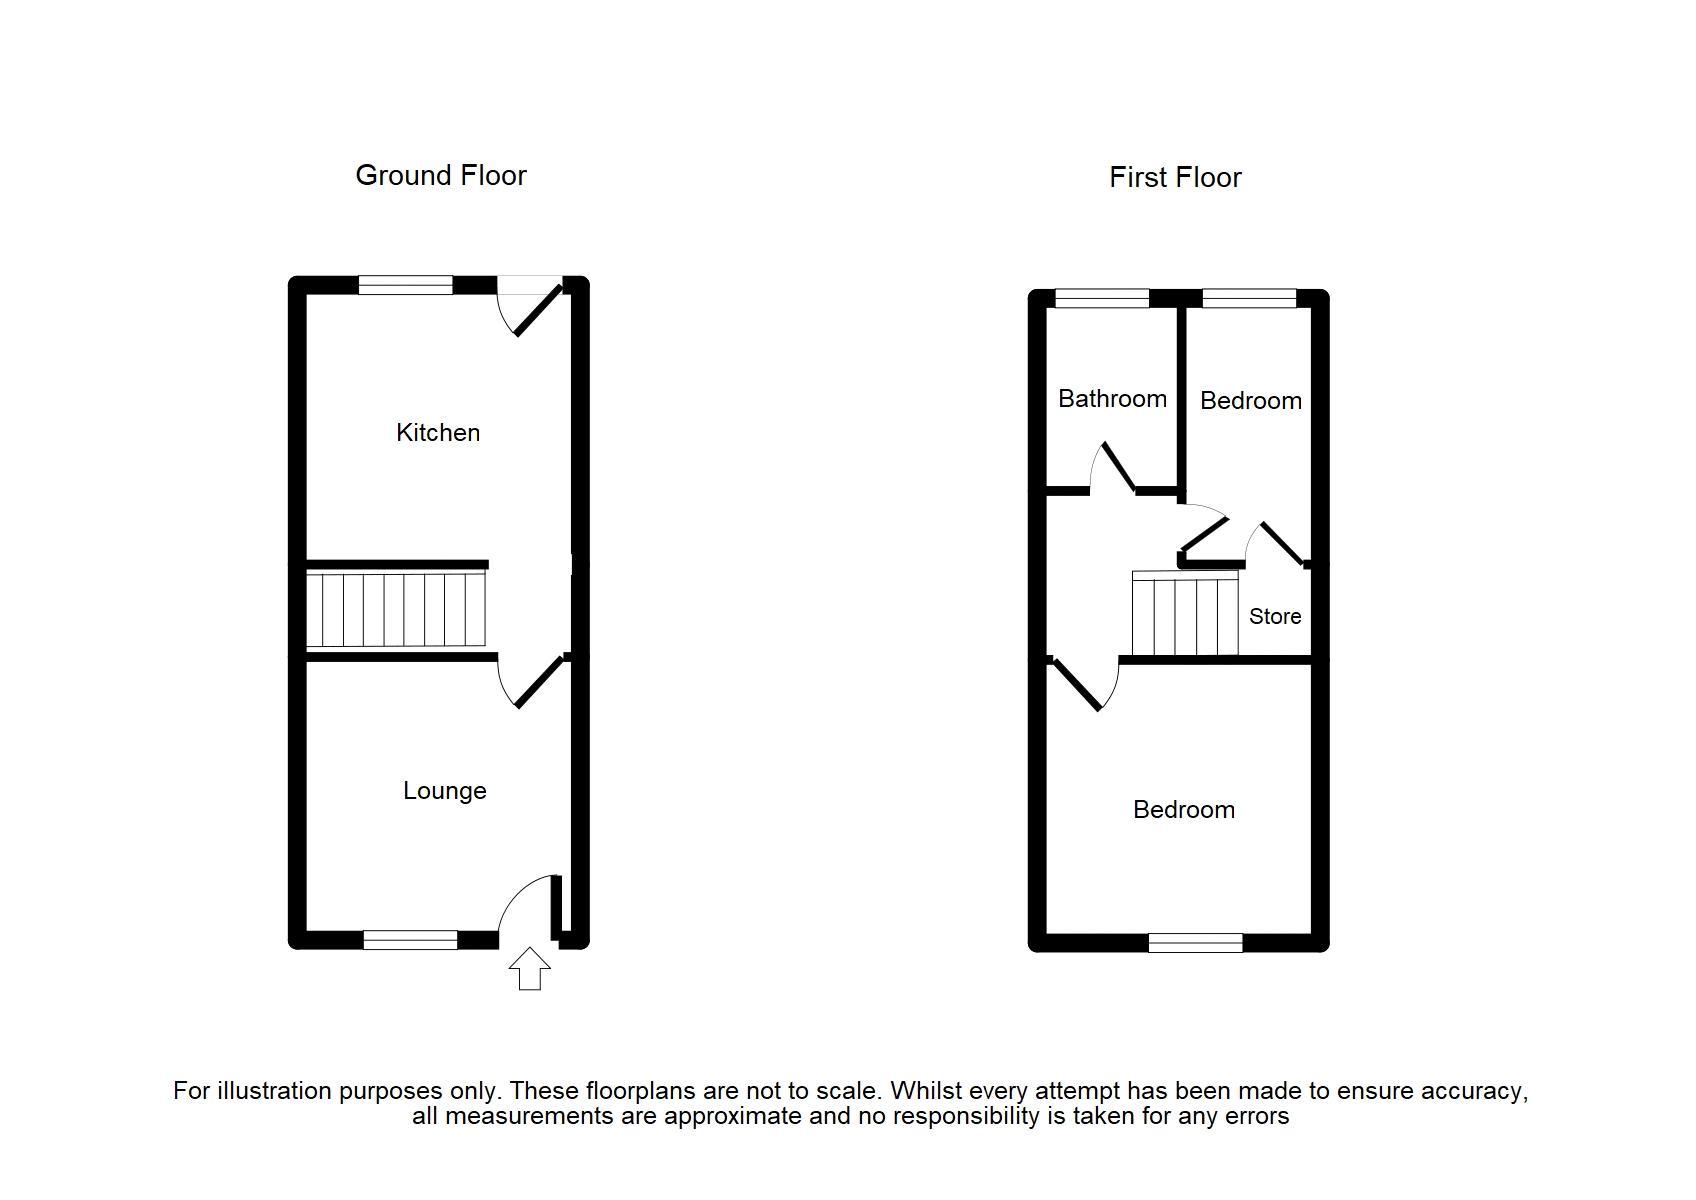 44 Lion Street Floorplan